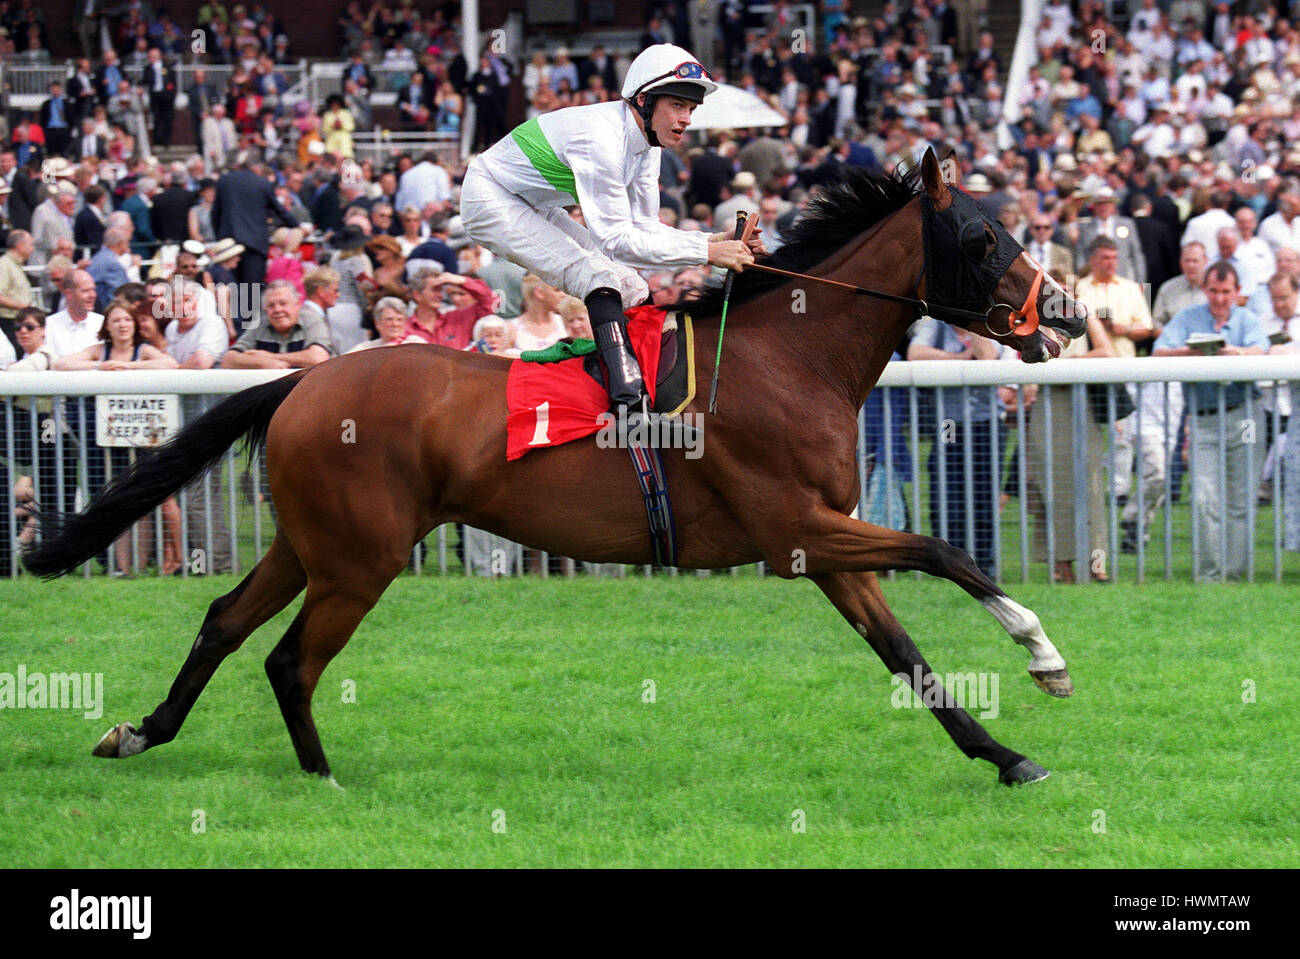 CAPE GRACE RIDDEN BY RICHARD HILLS 22 August 2000 - Stock Image